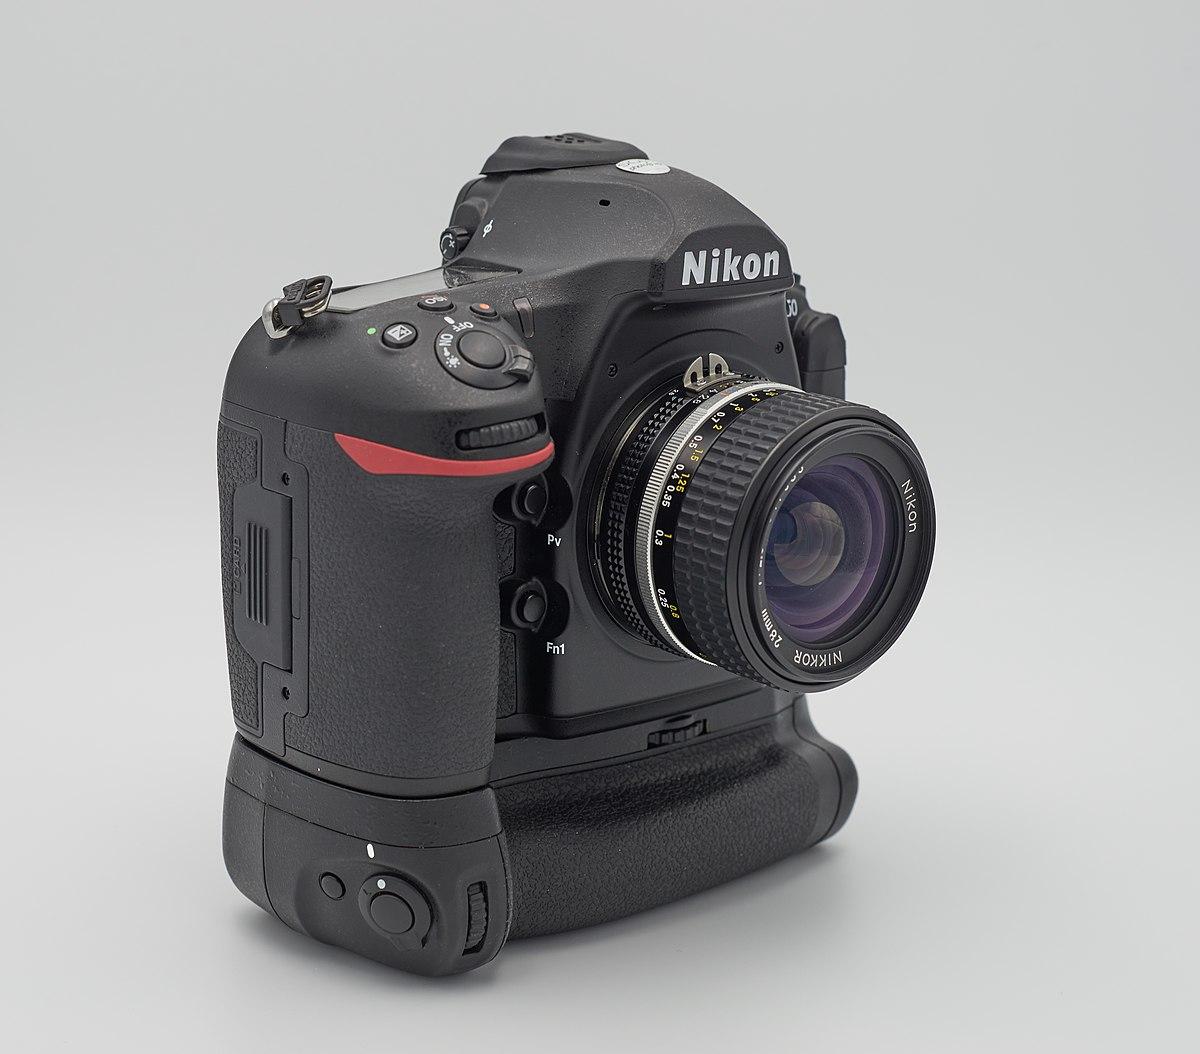 دوربین عکاسی نیکون D850 با گریپ